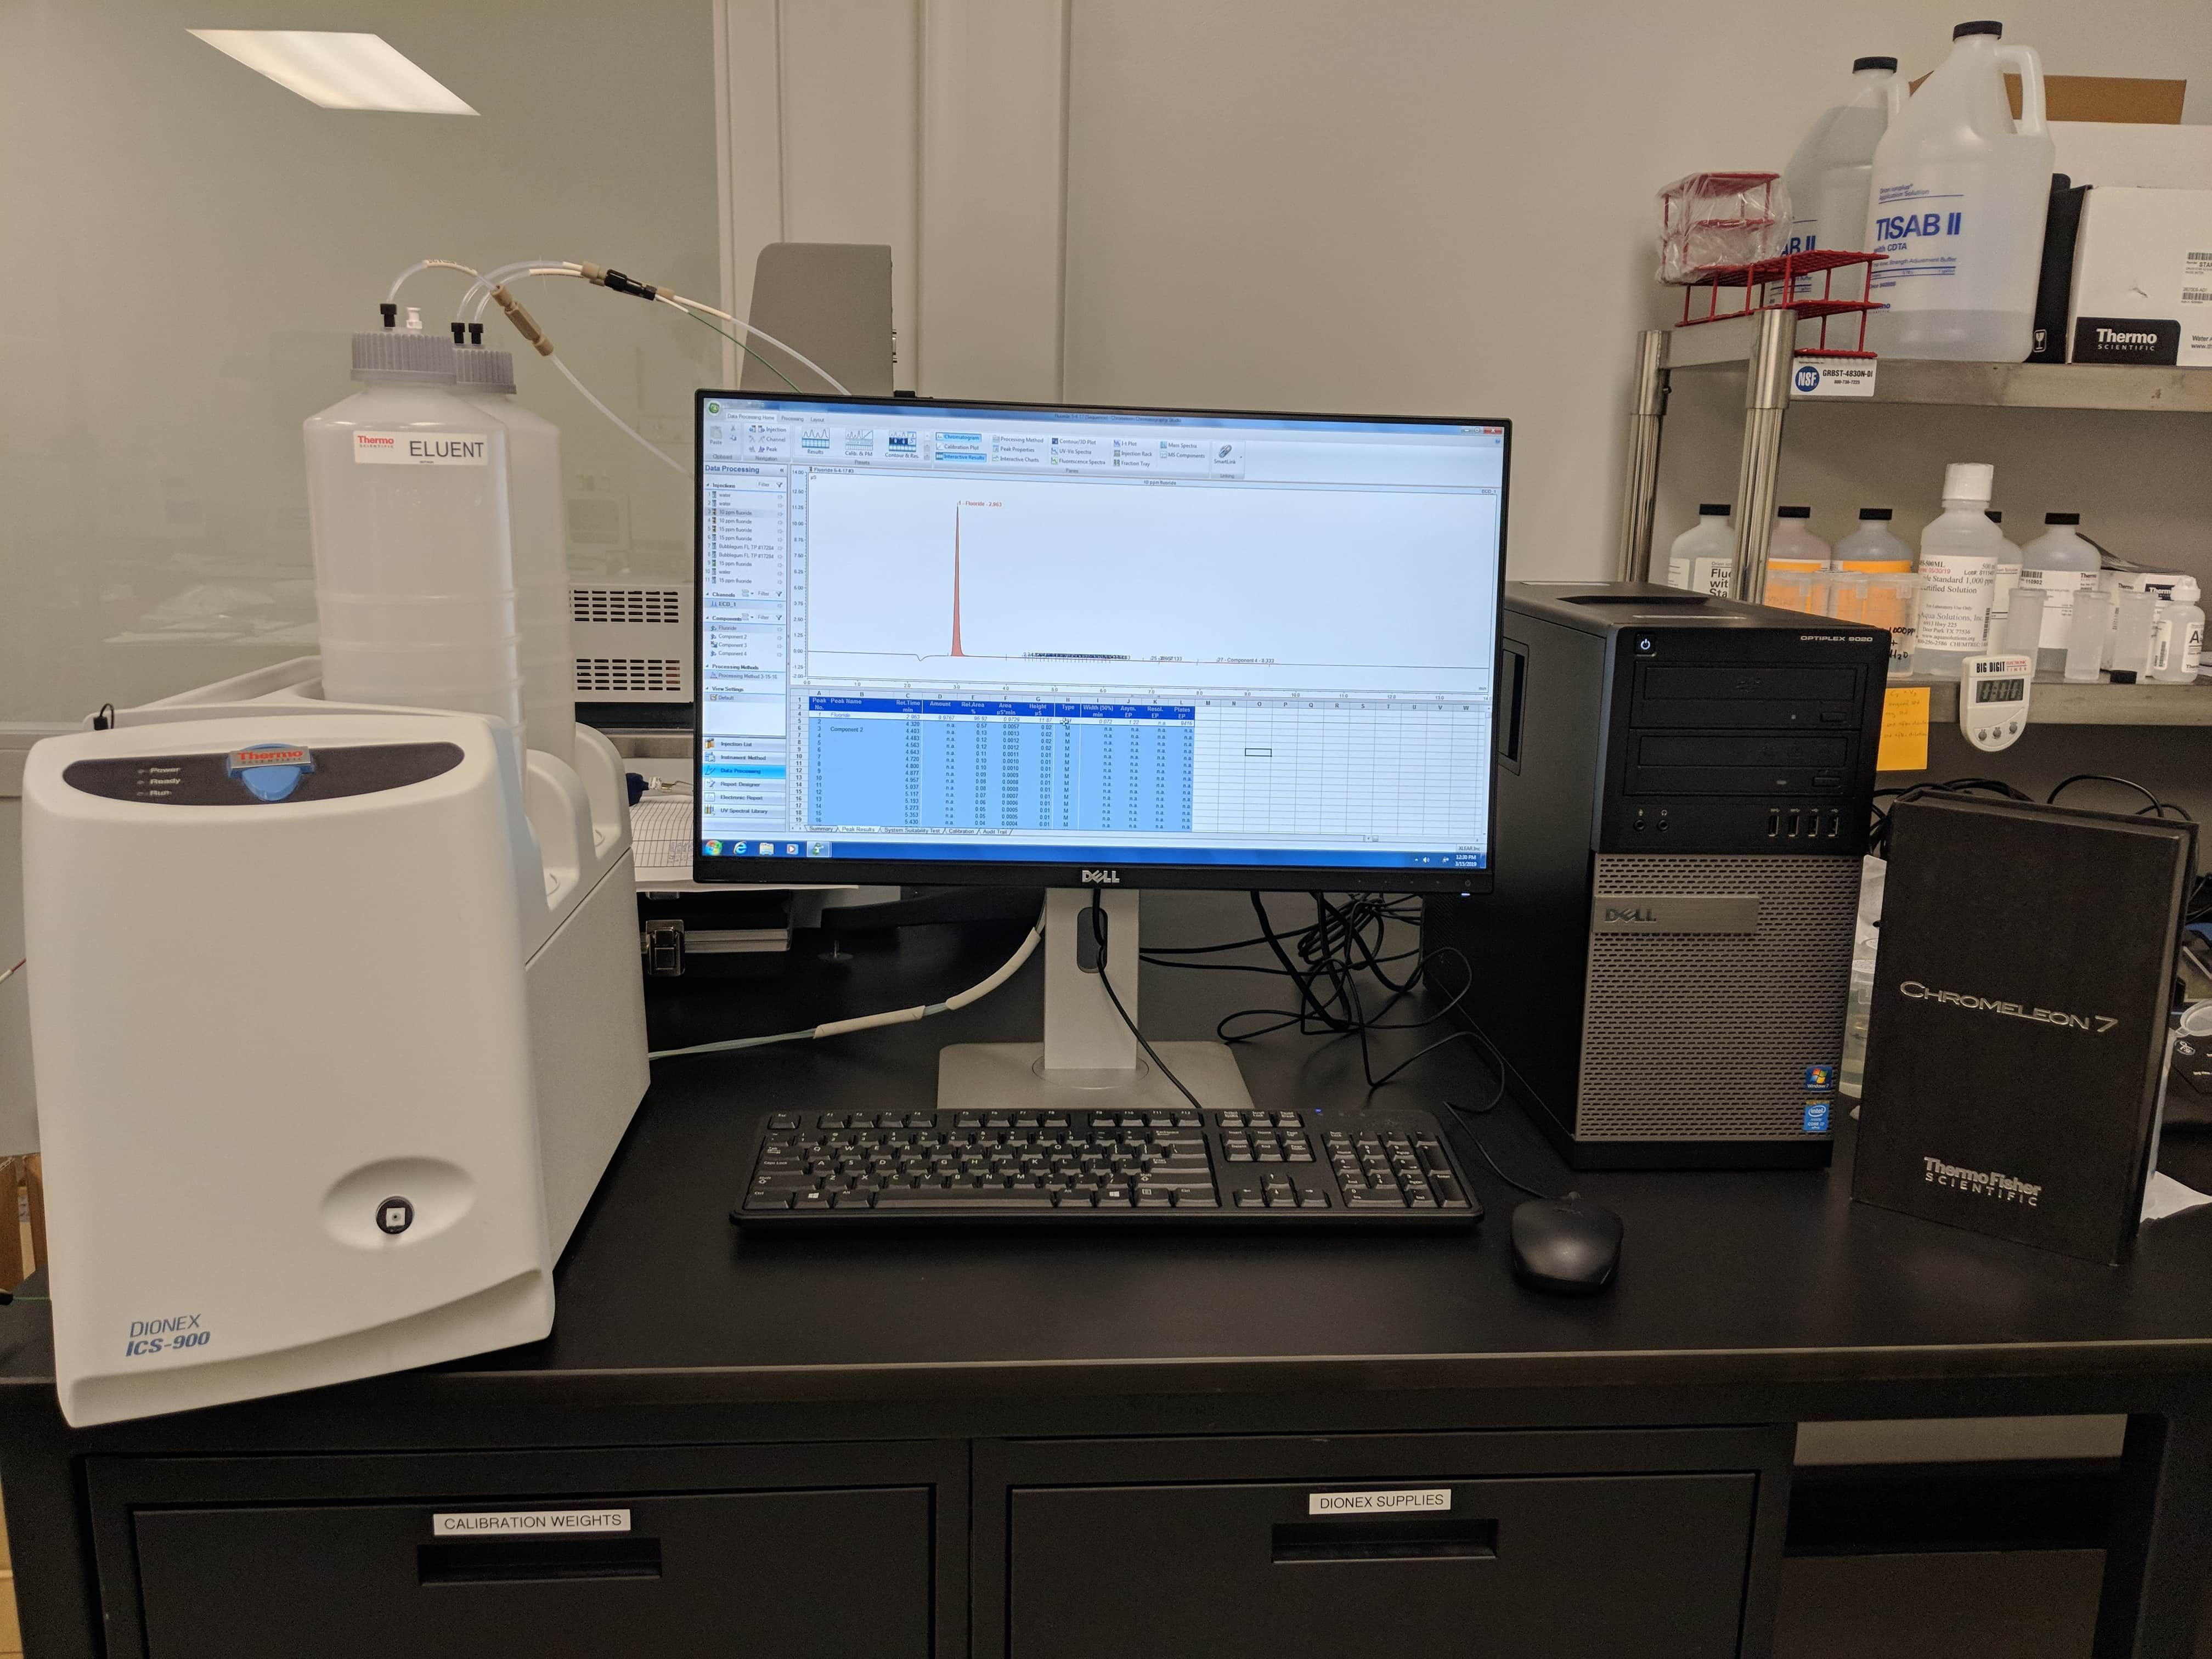 Dionex ICS-900 Ion Chromatography System